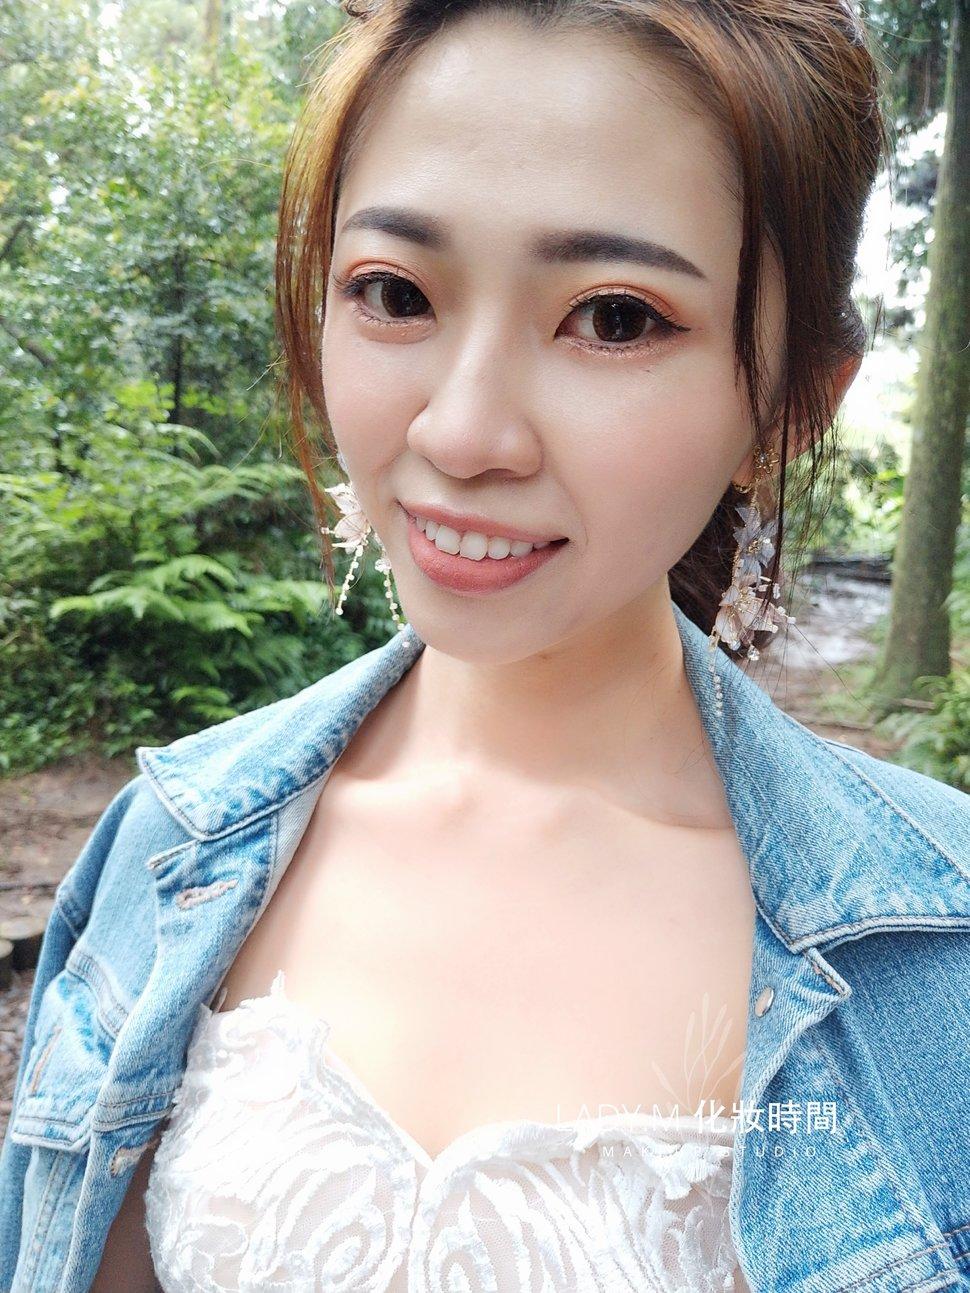 Photo_1555427800857 - LadyM化妝時間•Mia makeup - 結婚吧